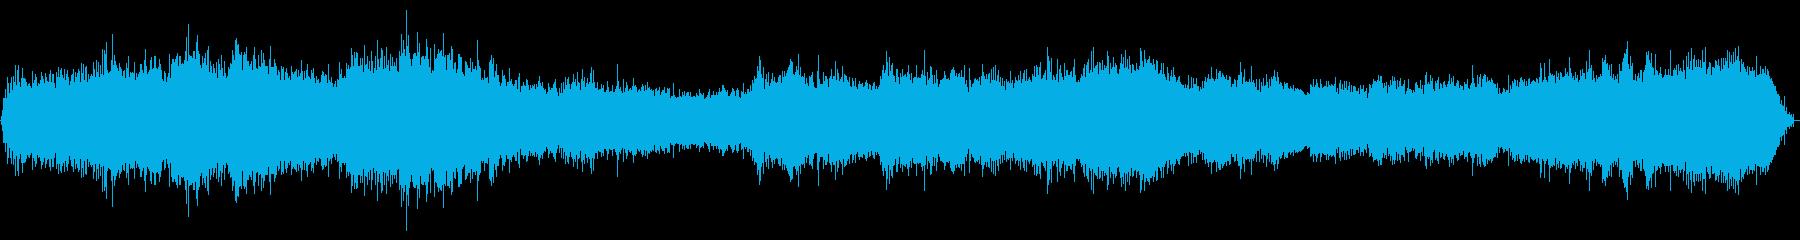 ELECTRIC HEDGE TR...の再生済みの波形